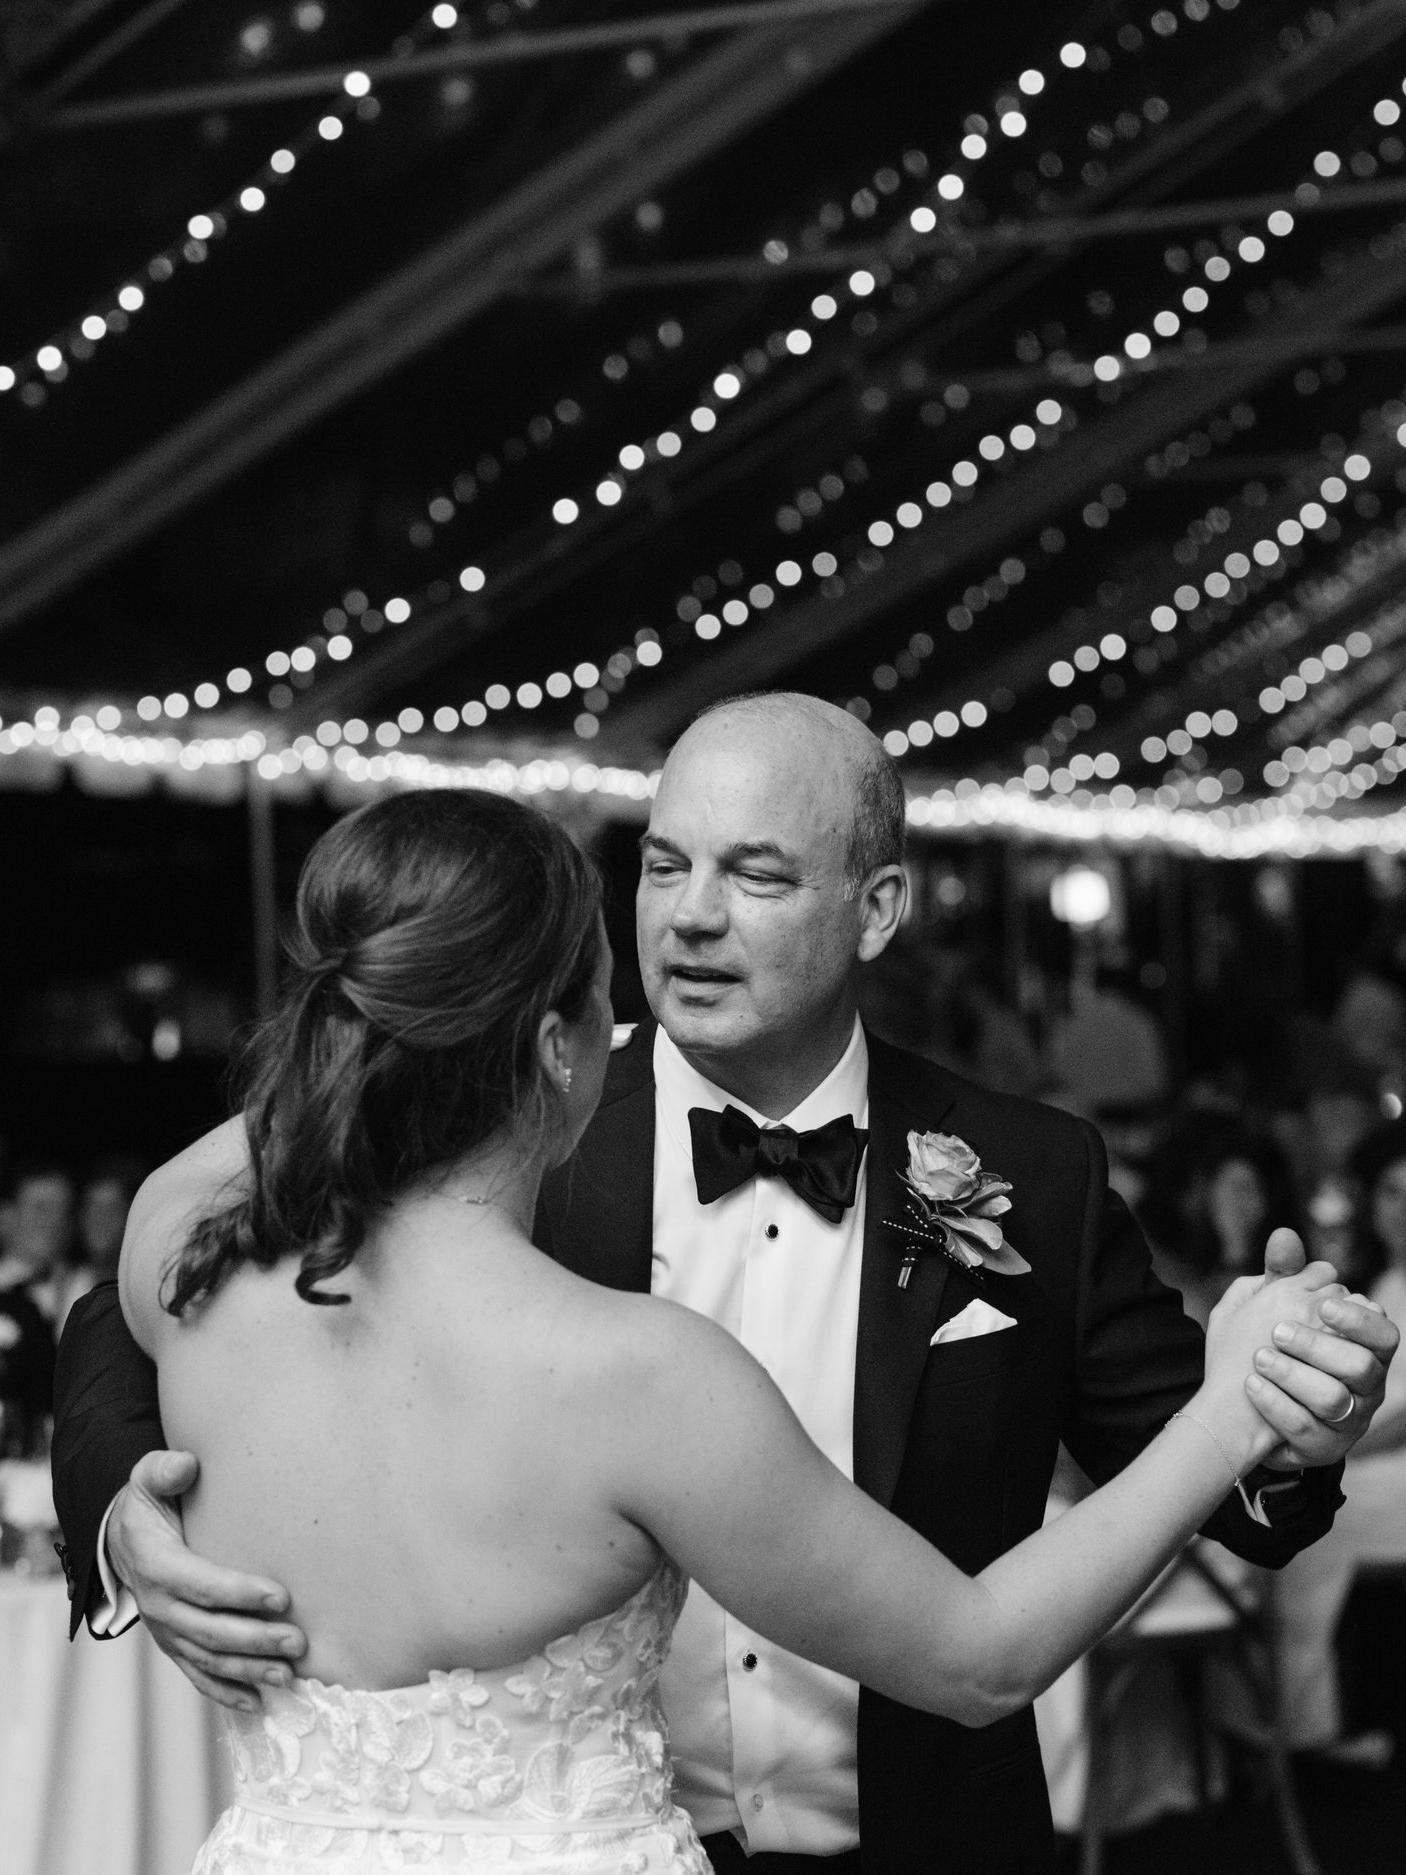 Kyle John l Fine Art Wedding Photography l Chicago, Copenhagen, California, New York, Destination l Blog l Kate and Michael_Winnetka_41